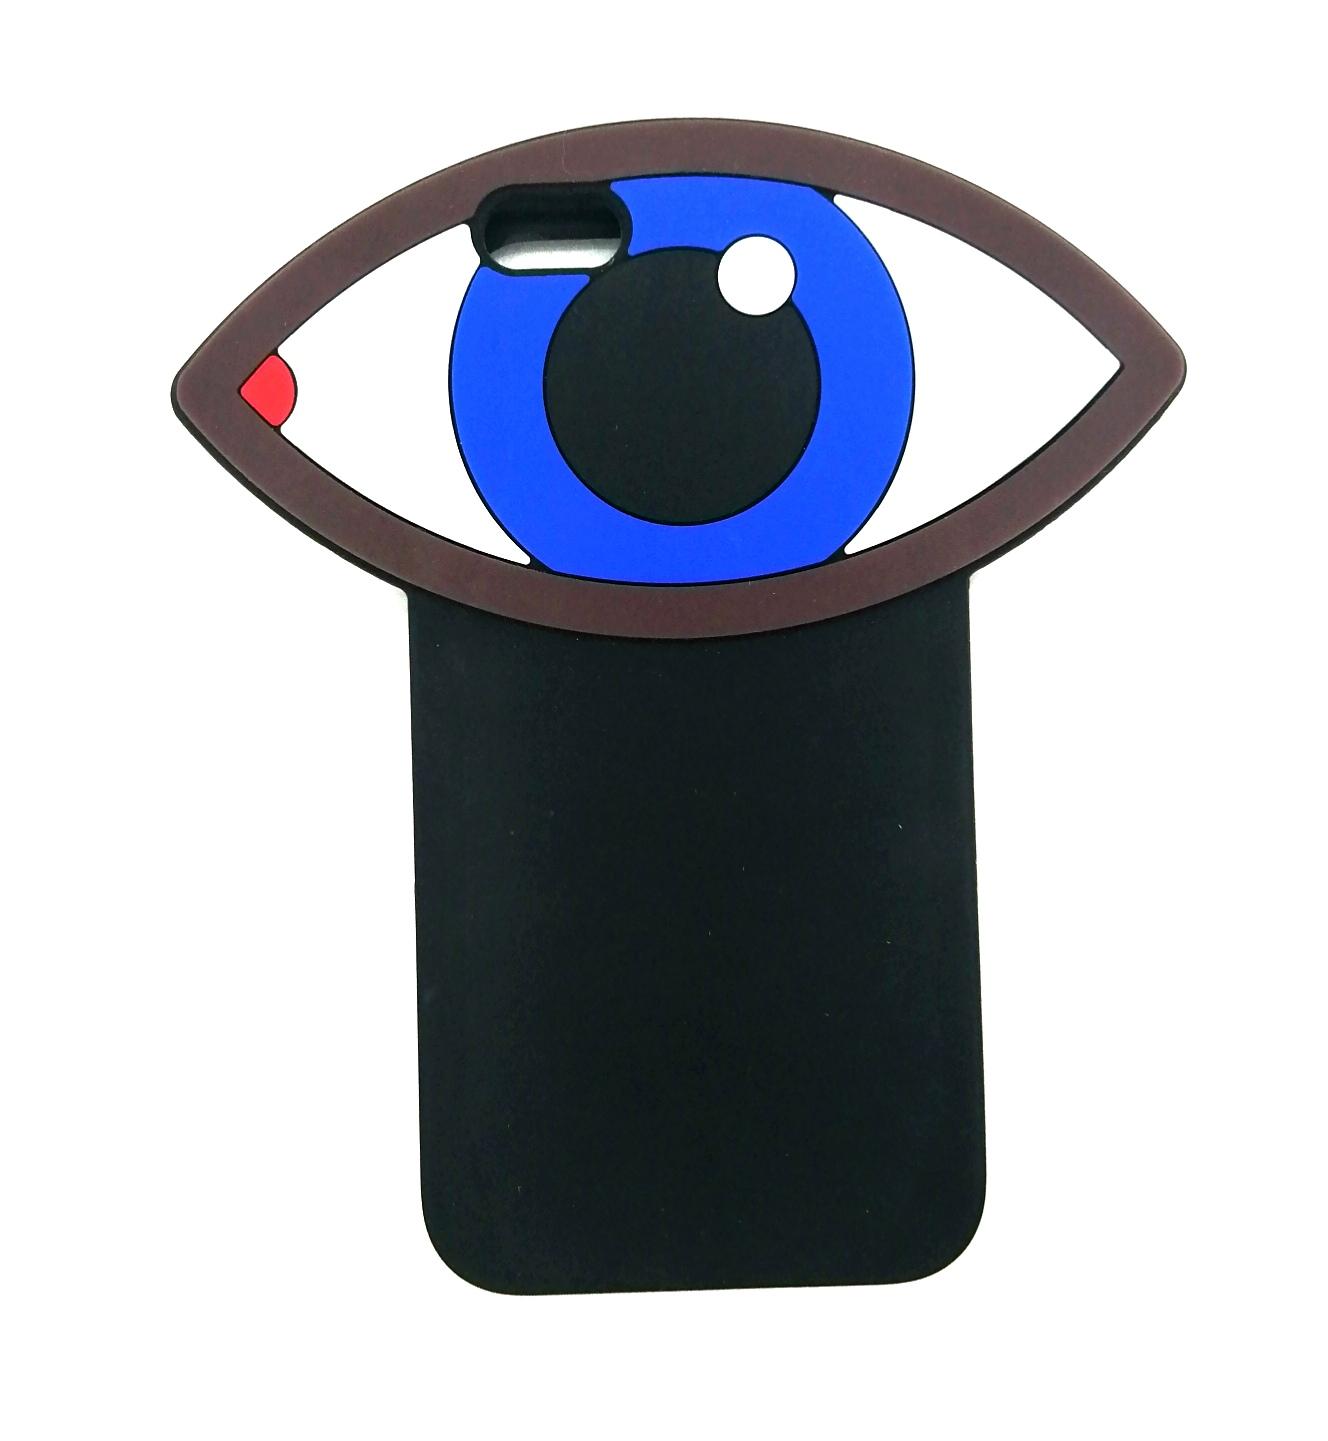 Чехол для сотового телефона ZUP Case Eyes для iPhone 6/6s, черный чехол для сотового телефона zup lord nermal для iphone xs max черный